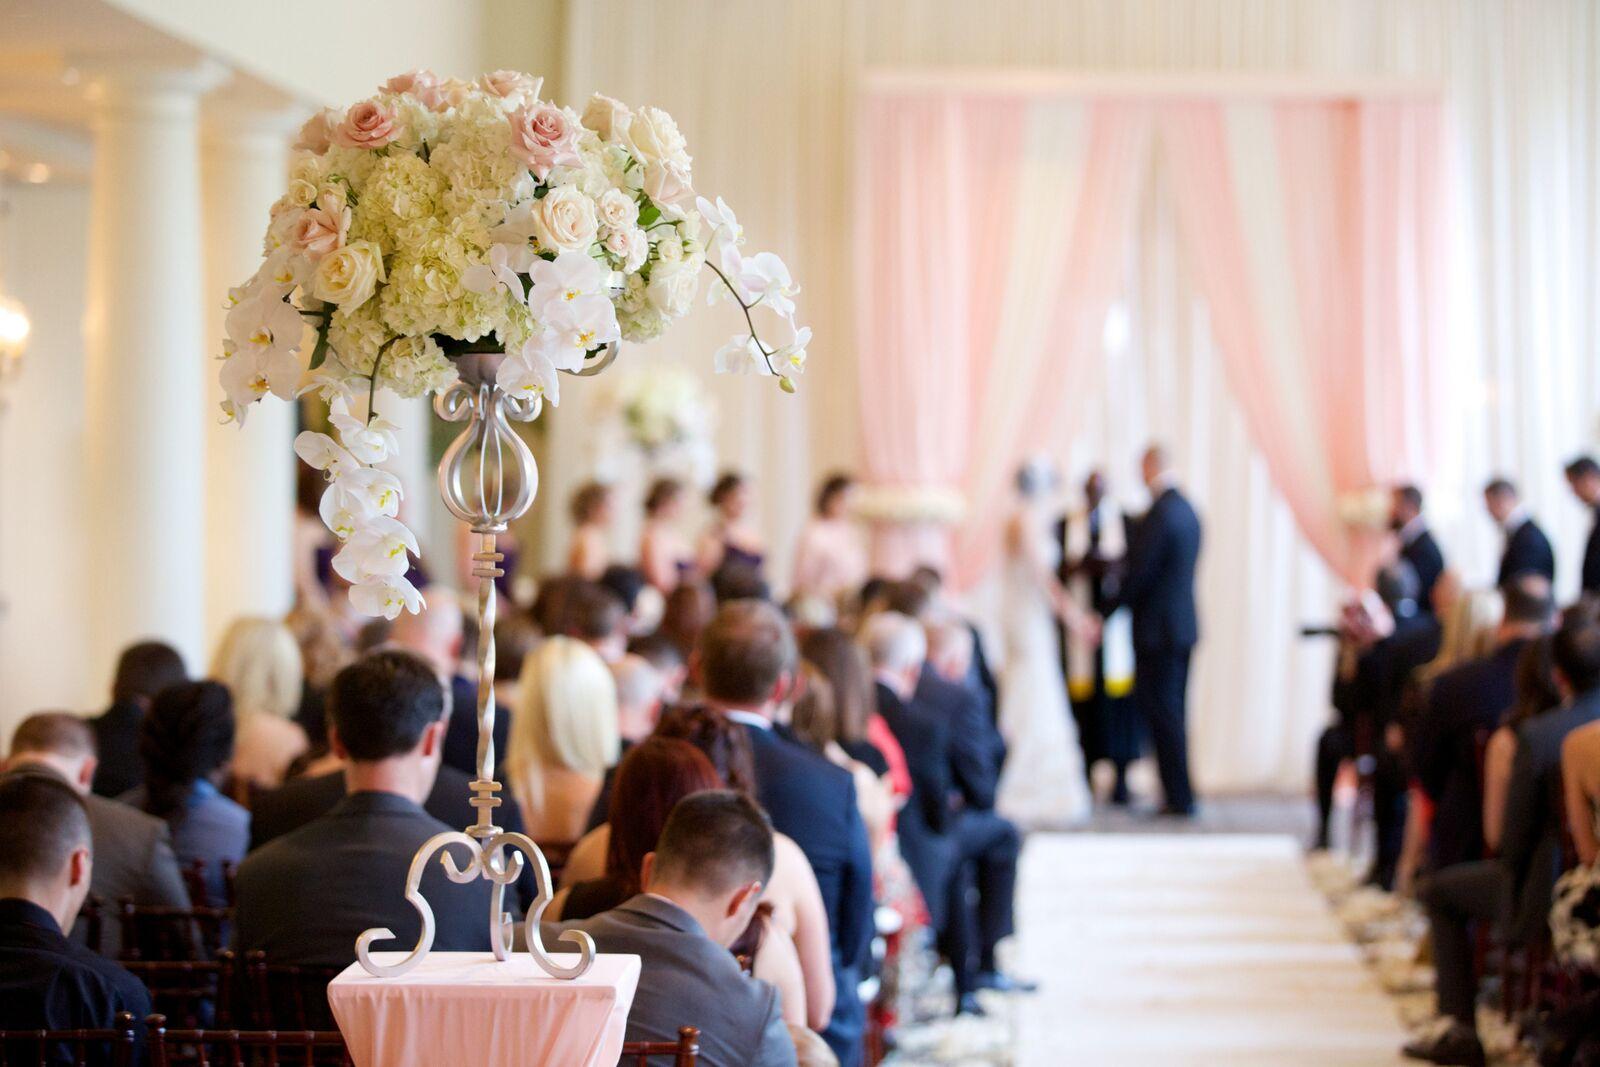 Wedding Photographer: www.jensenlarson.com | Wedding Ceremony: Portofino Bay Hotel | Wedding Planner: E-Events